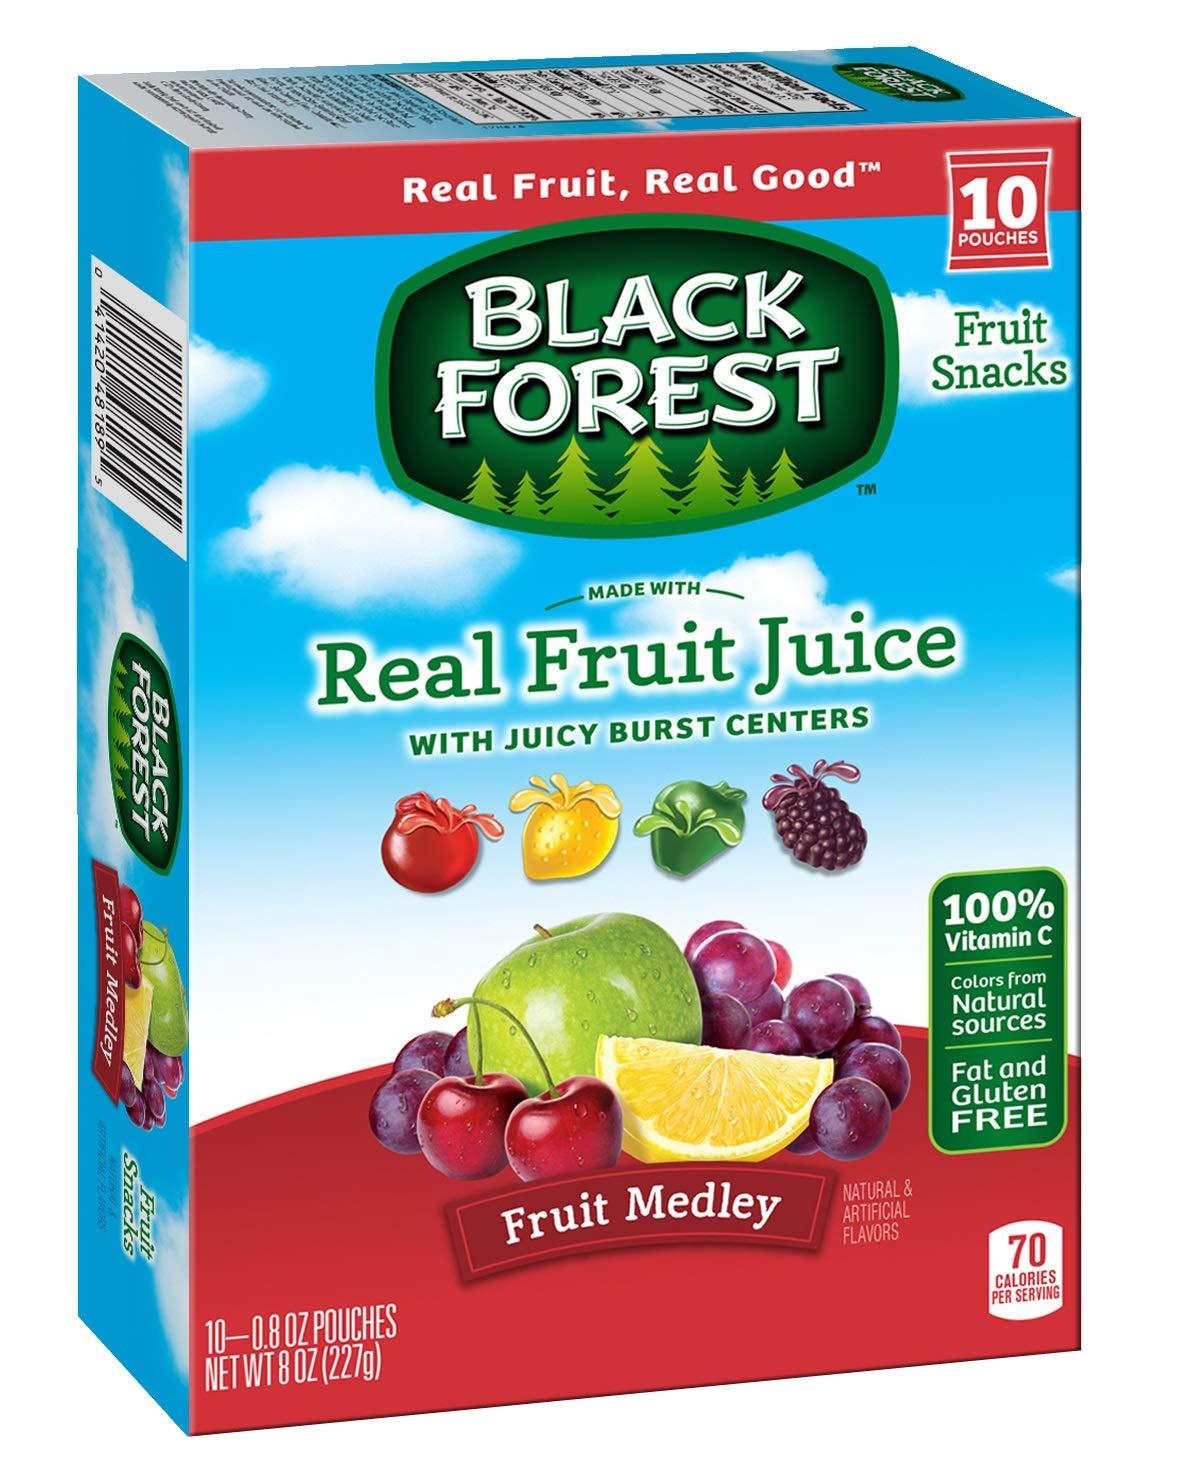 Black Forest Fruit Medley Fruit Snacks Juicy Burst Centers, 0.8 Oz Pouches (Box of 80 pouches)